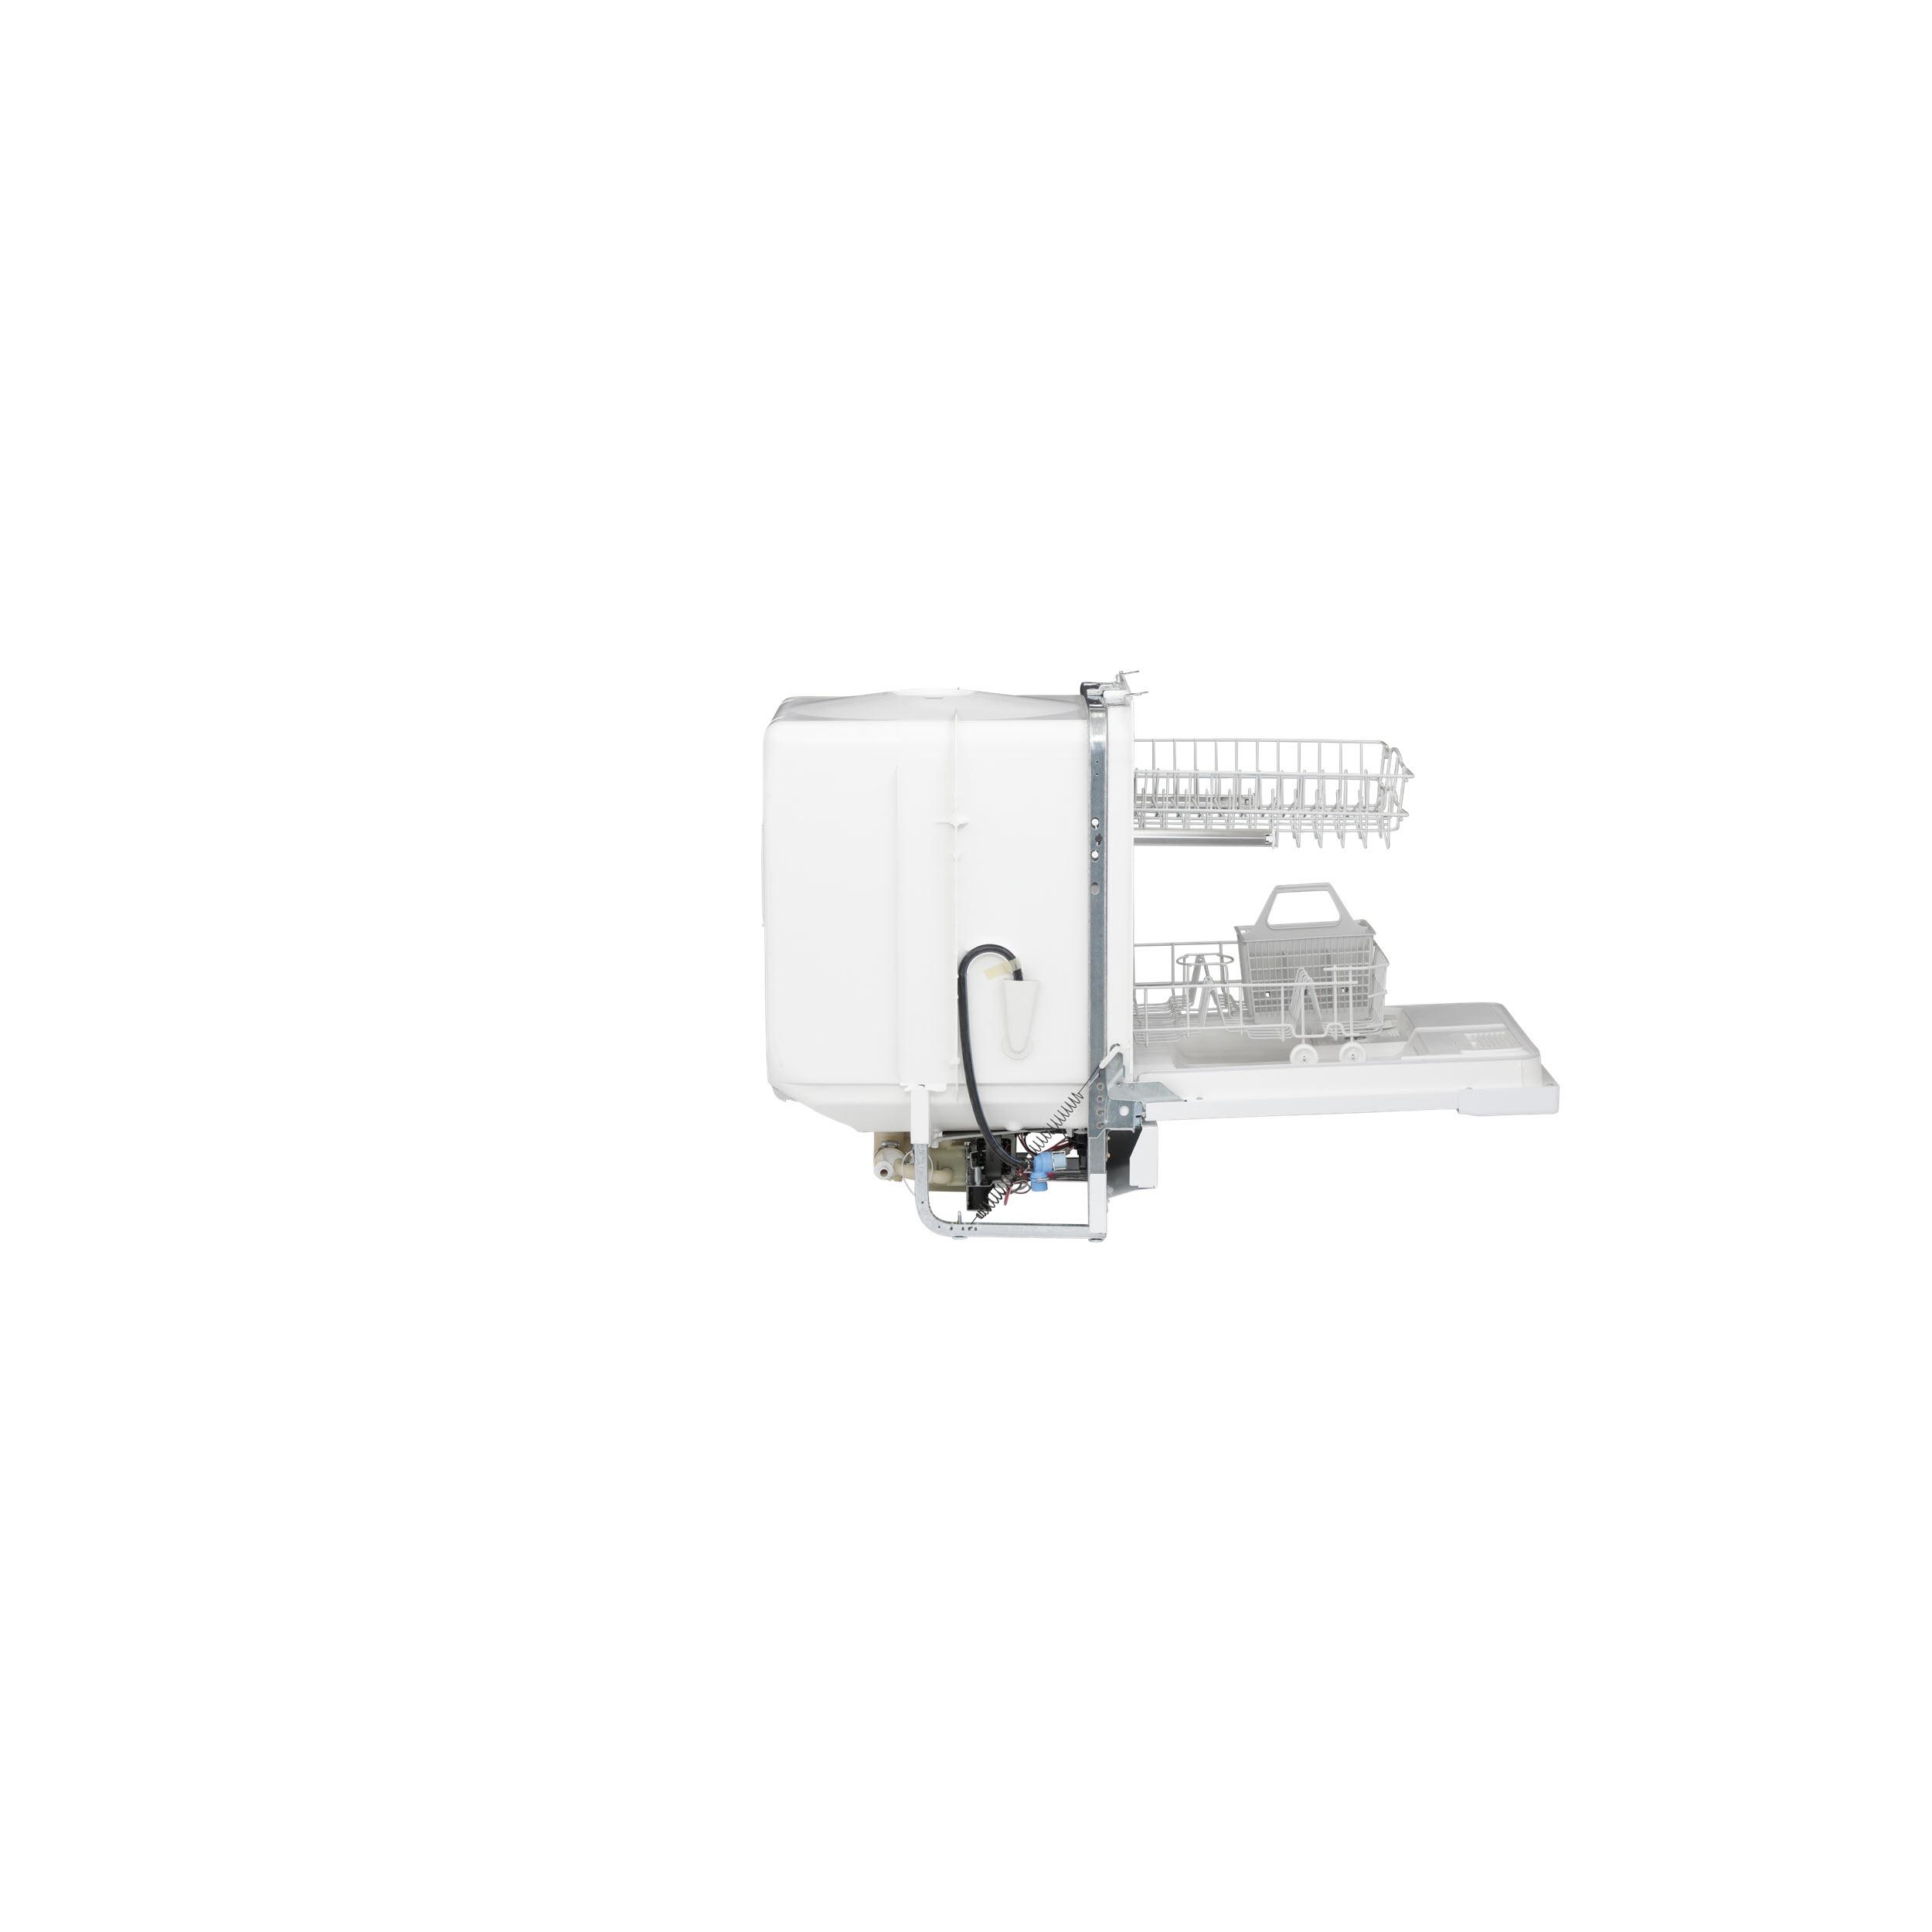 Model: GSD2100VWW | GE GE® Built-In Dishwasher